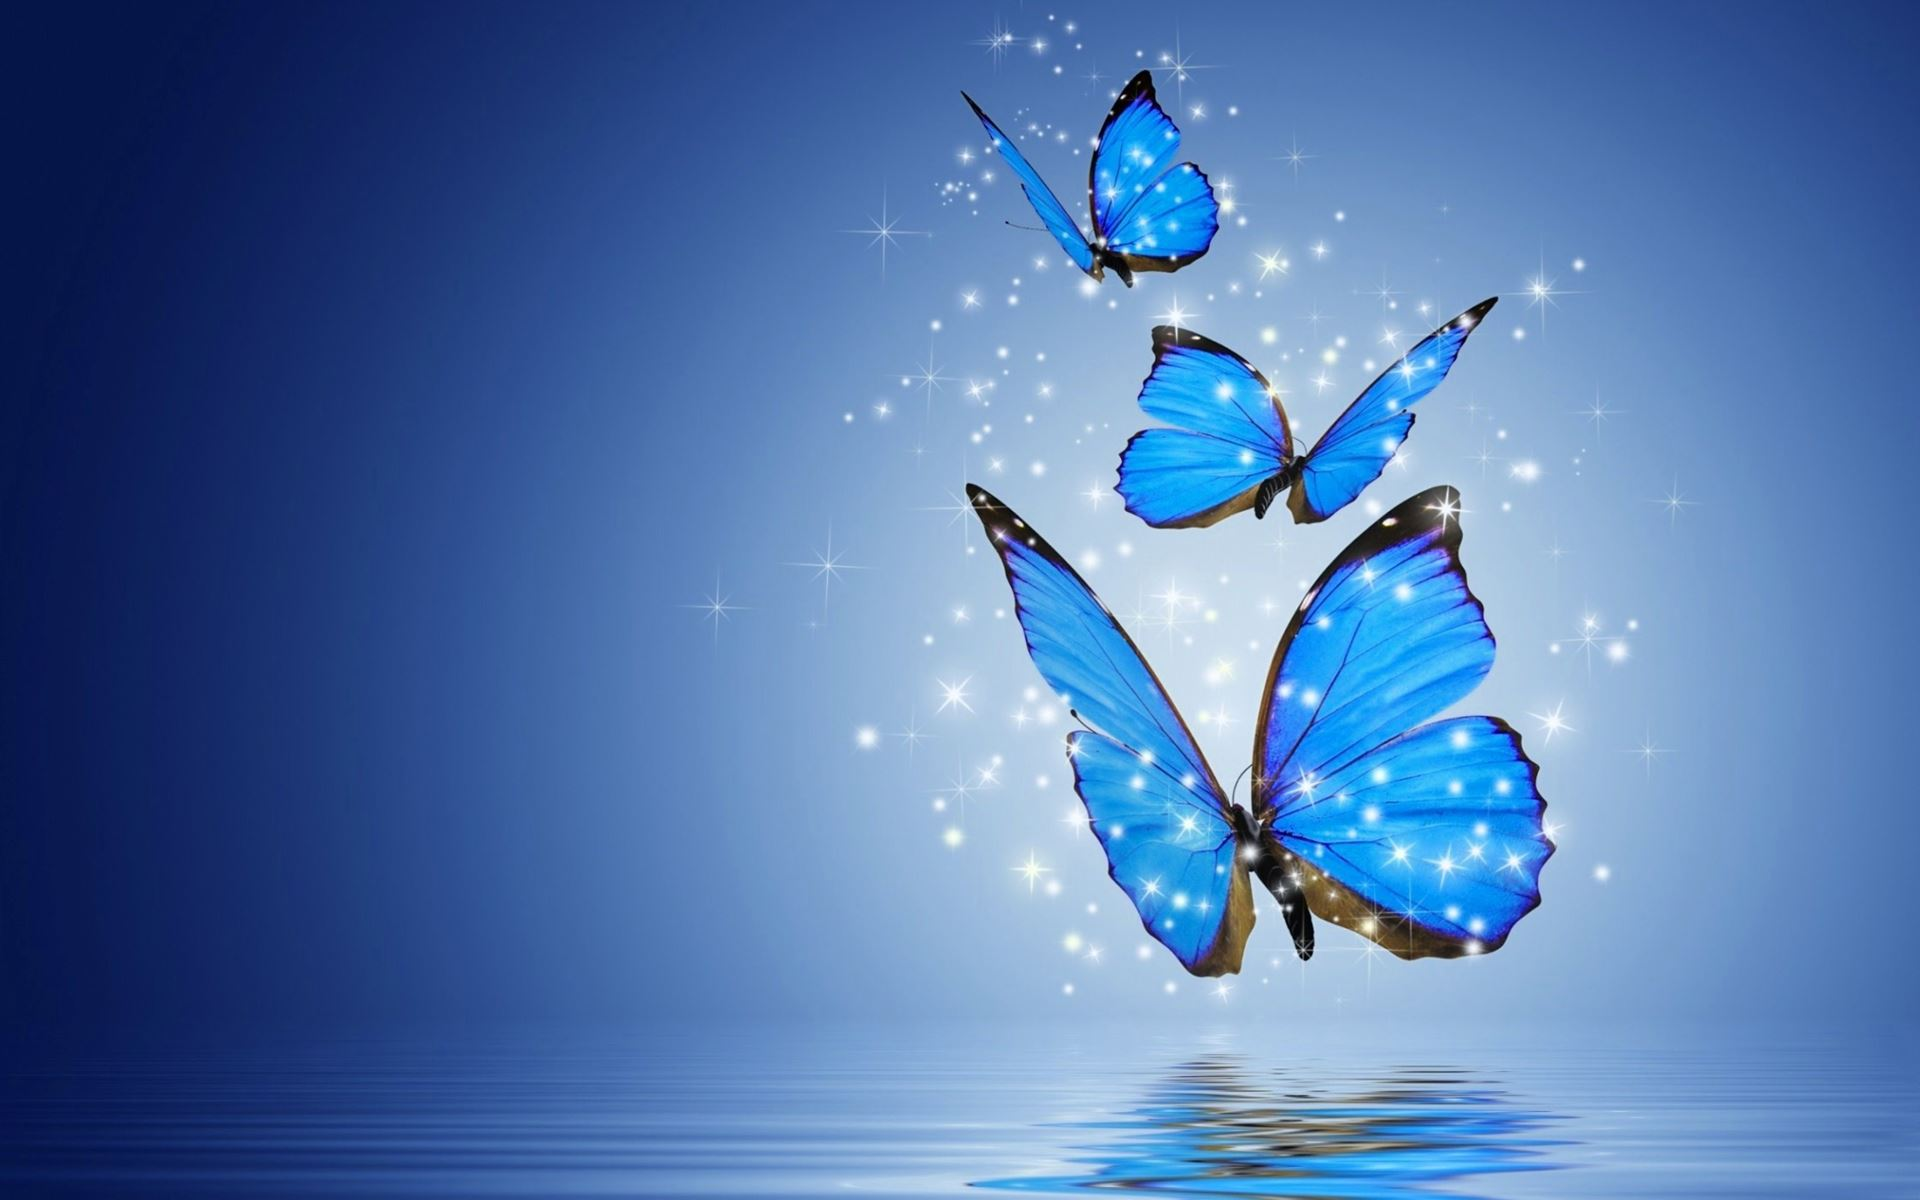 Бабочка1  № 2342650 загрузить